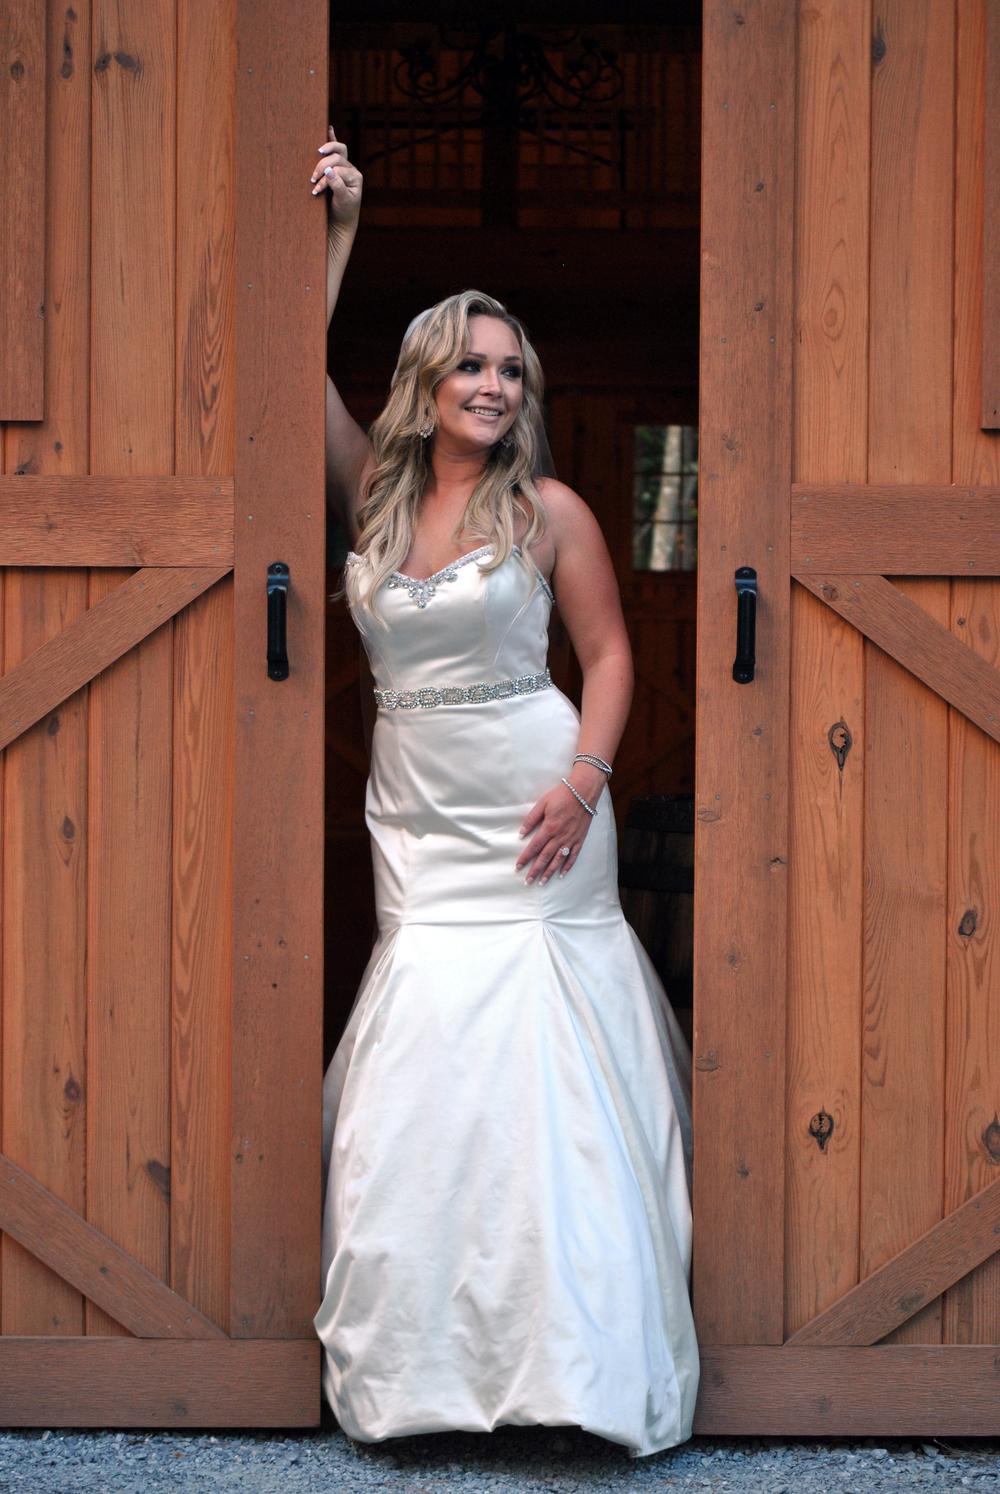 B_PSI_ENTERTAINMENT_WEDDING_BRIDAL_PHOTOGRAPHY_PHOTOGRAPHER_LYNCHBURG_BEDFORD_SIERRA_VISTA10